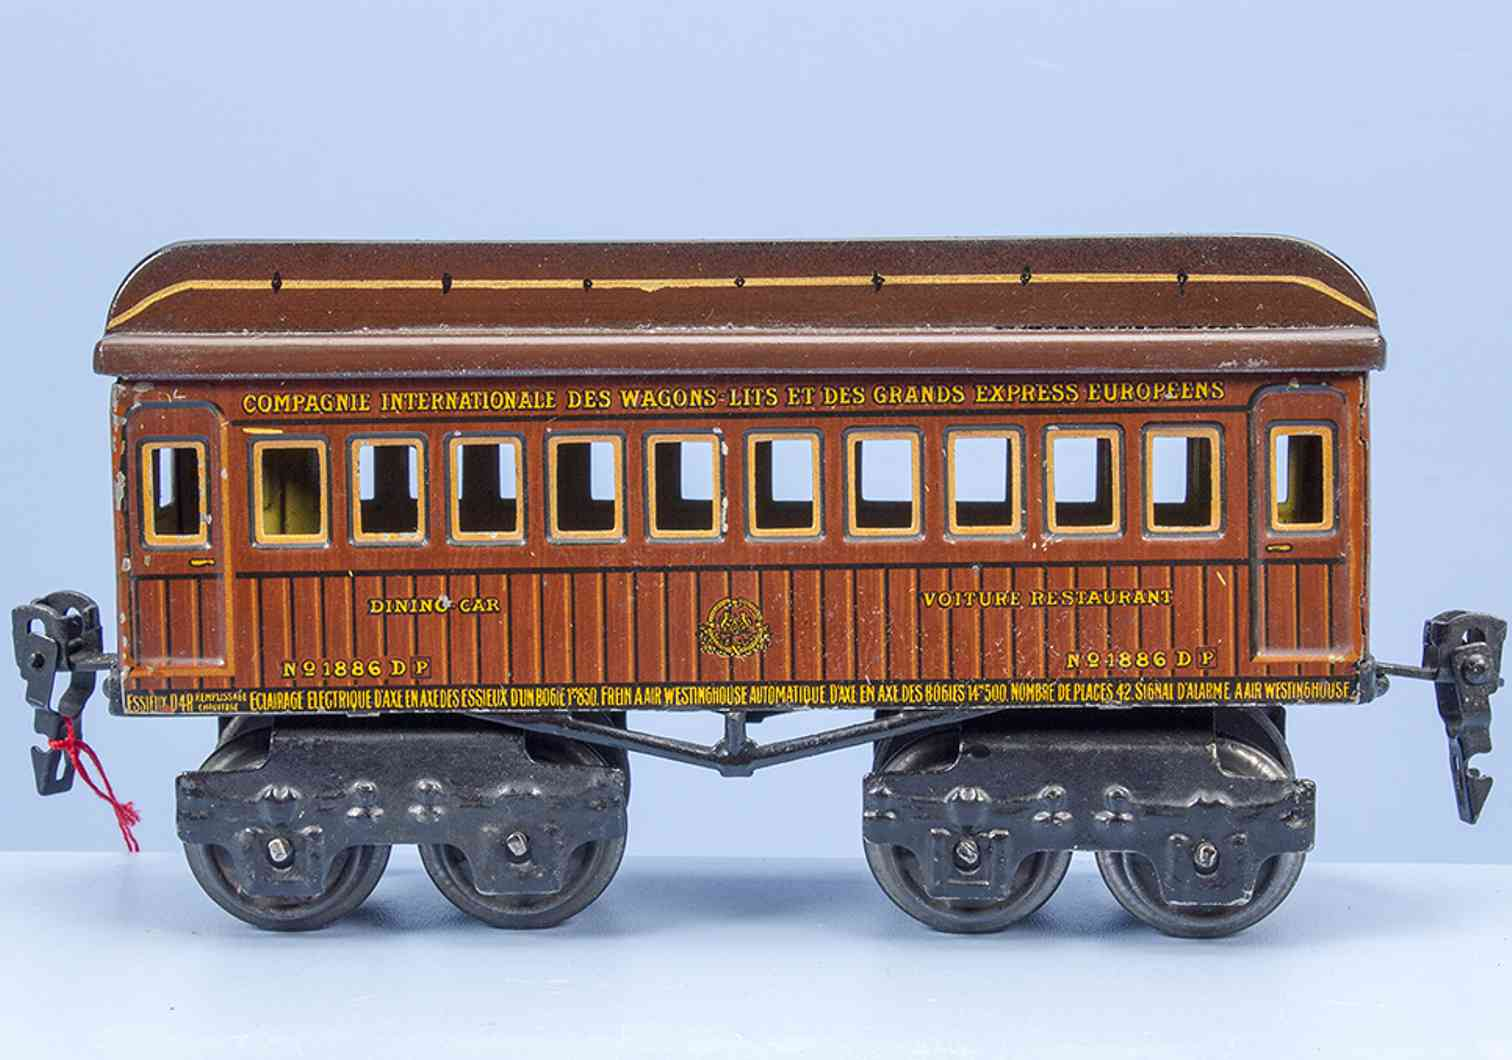 marklin maerklin 1886/0 sp 1915 railway toy international dining car gauge 0